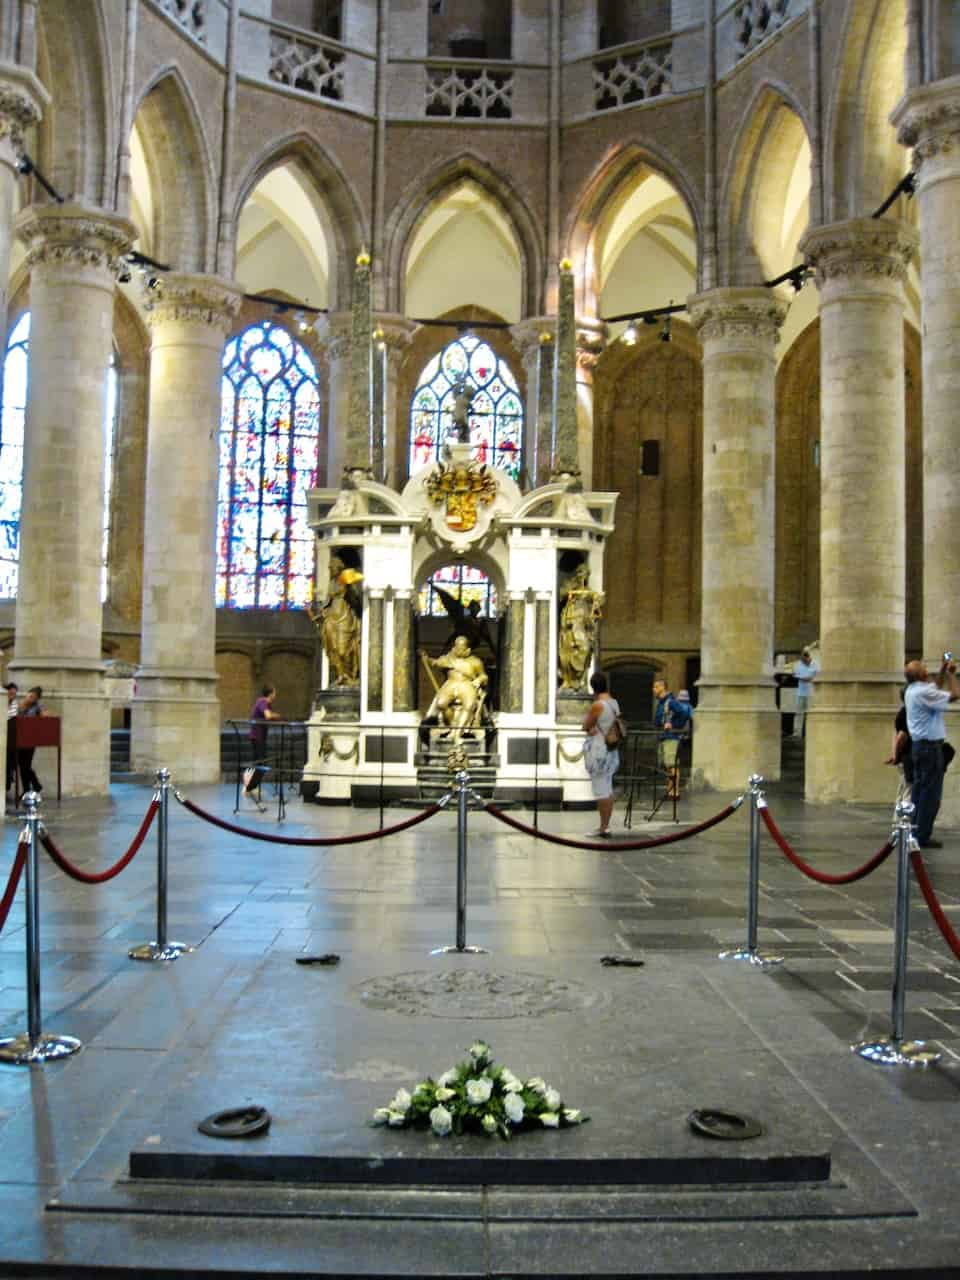 nieuwe-kerk-burial-vault-netherlands-royal-family-delft-photo